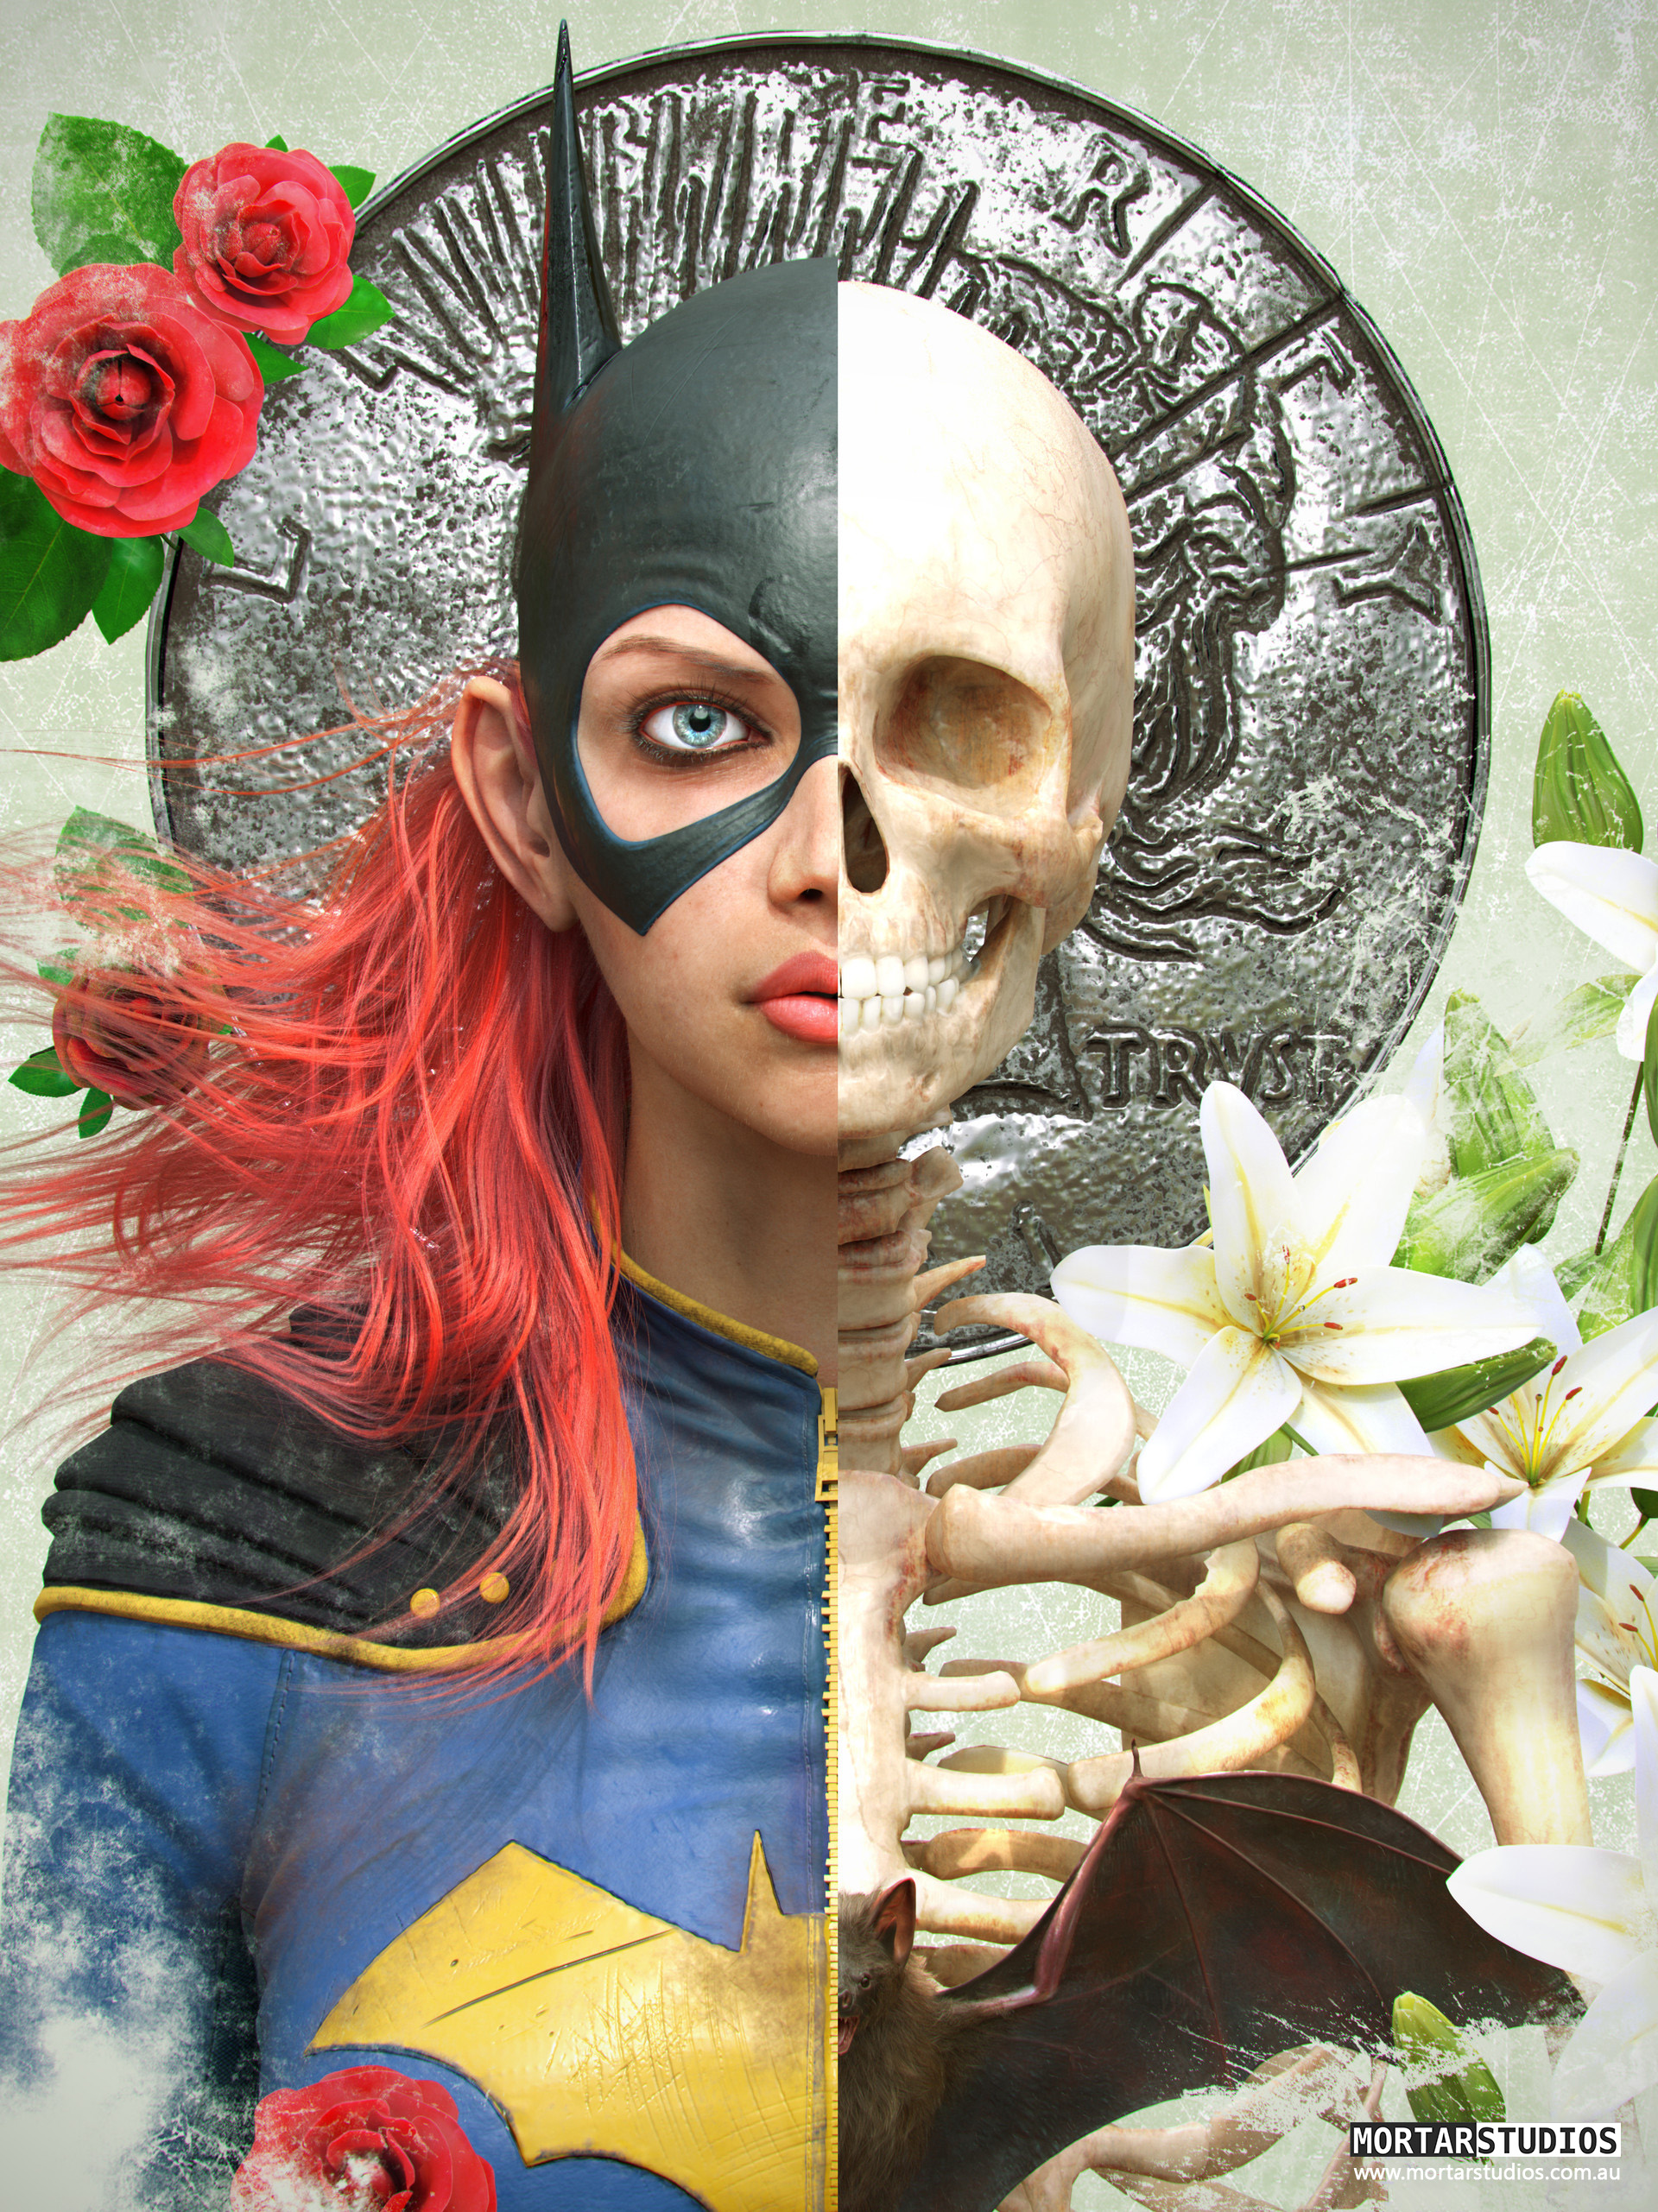 Mortar Studios-batgirl-01.jpg